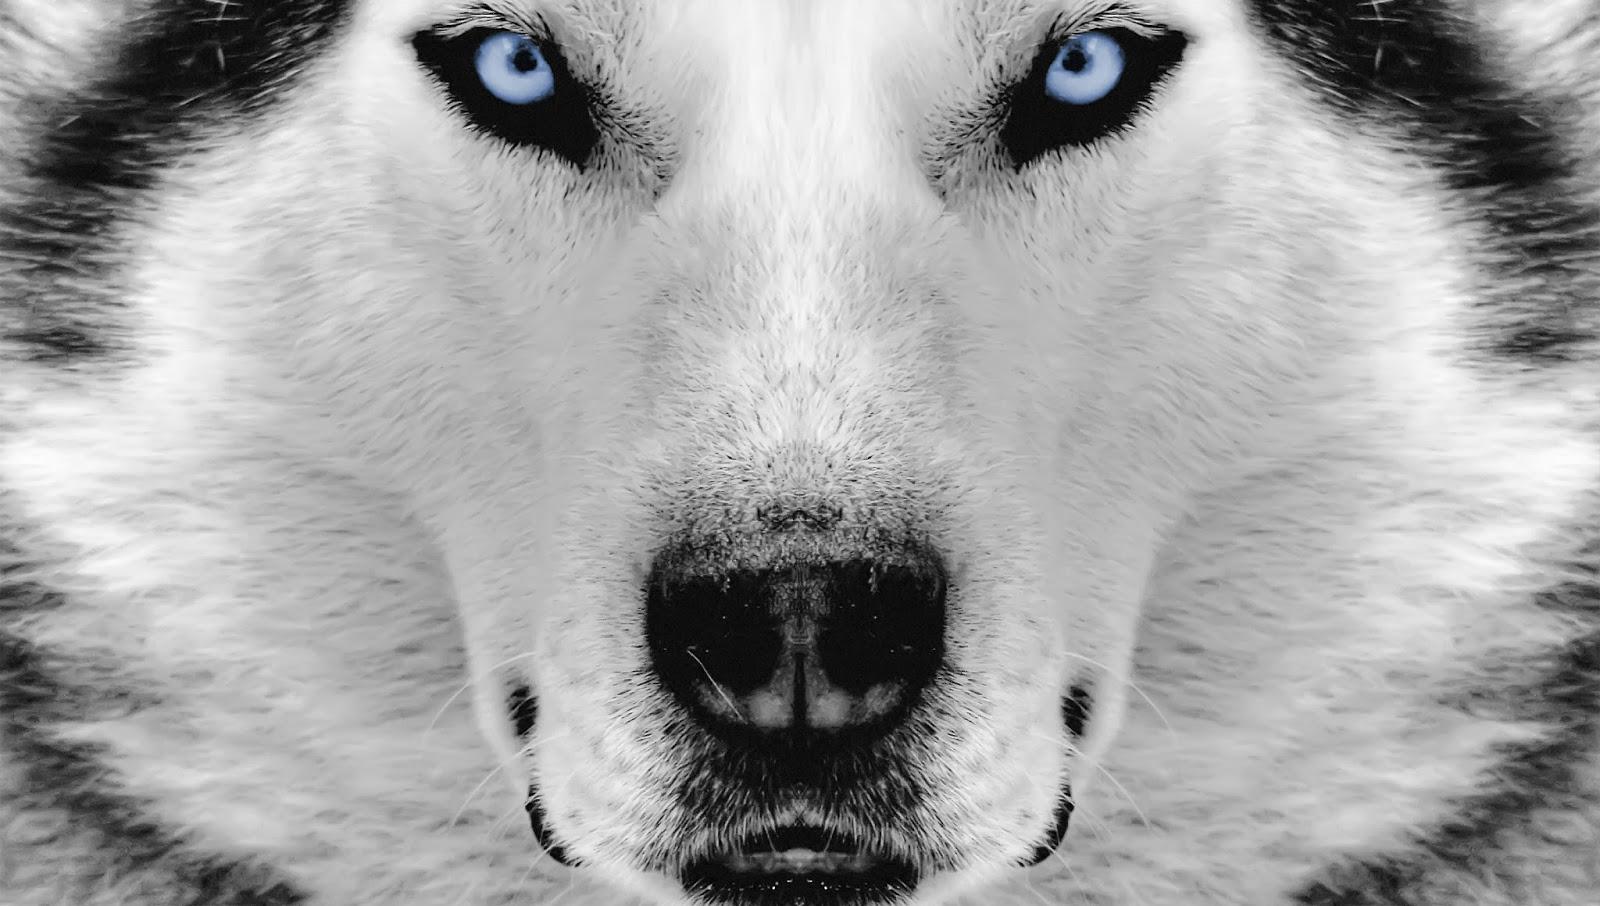 pictures of huskies 479 best siberian husky images on pinterest siberian of pictures huskies